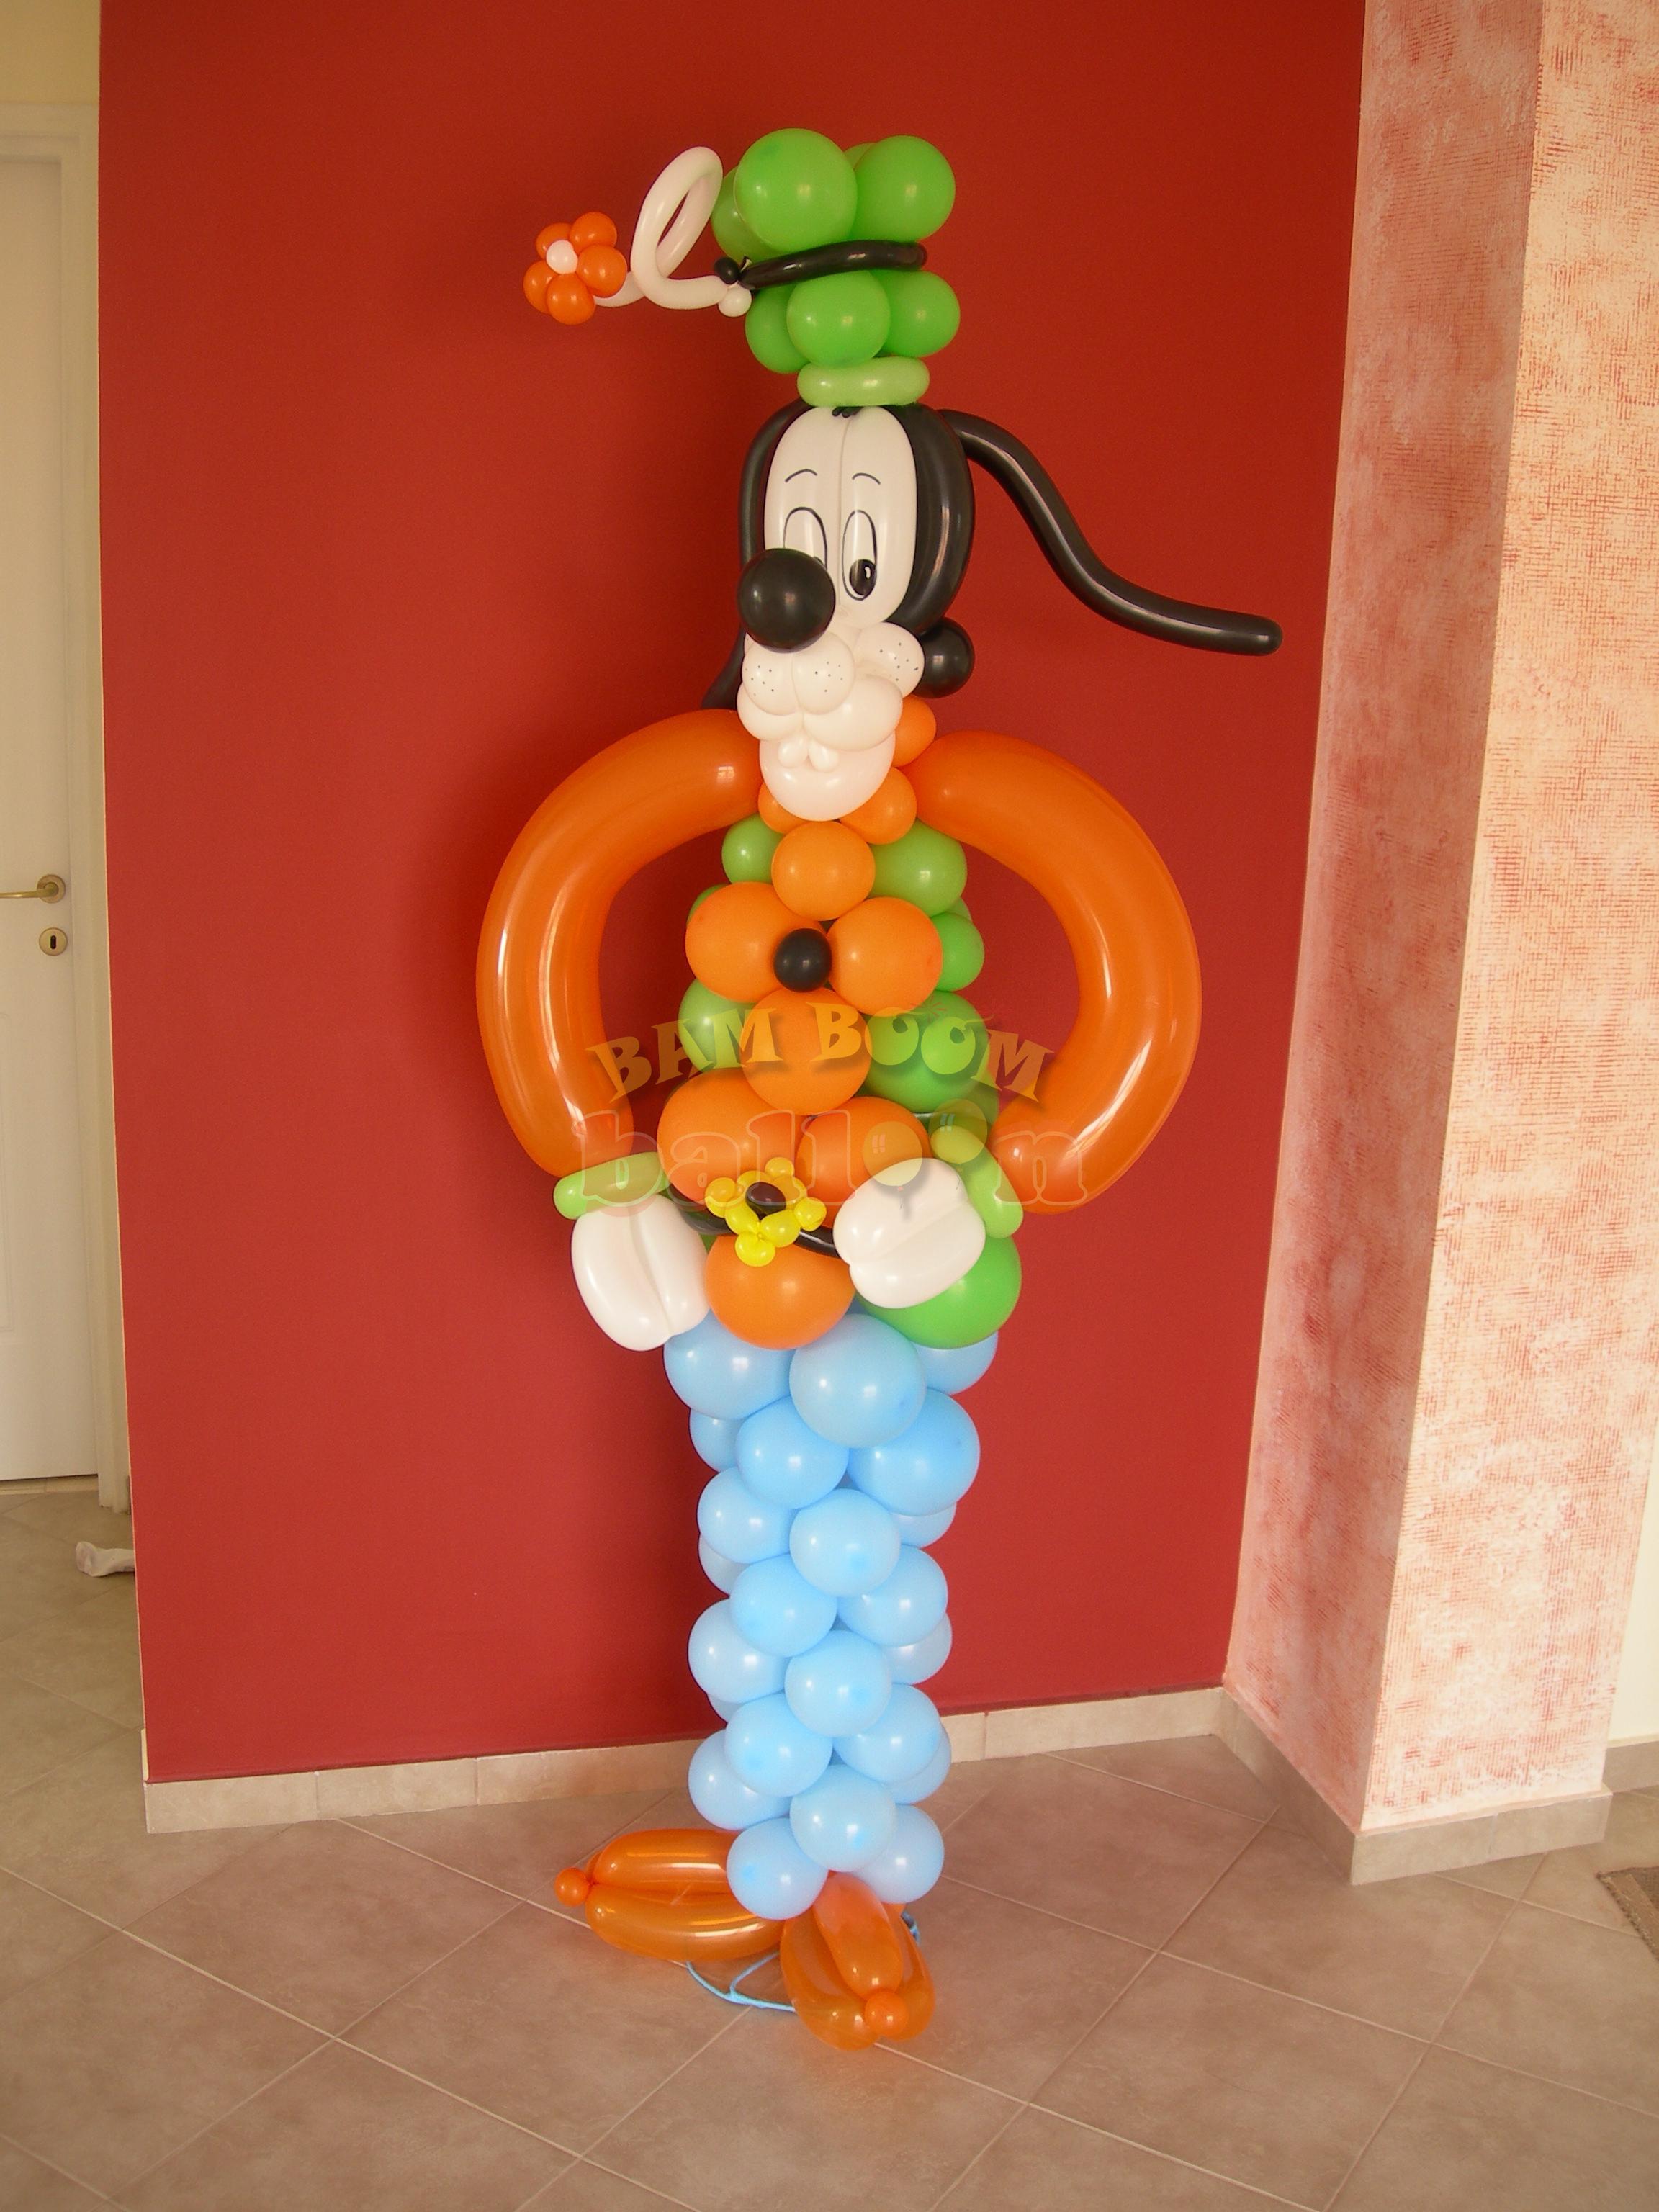 Goofy με μπαλόνια